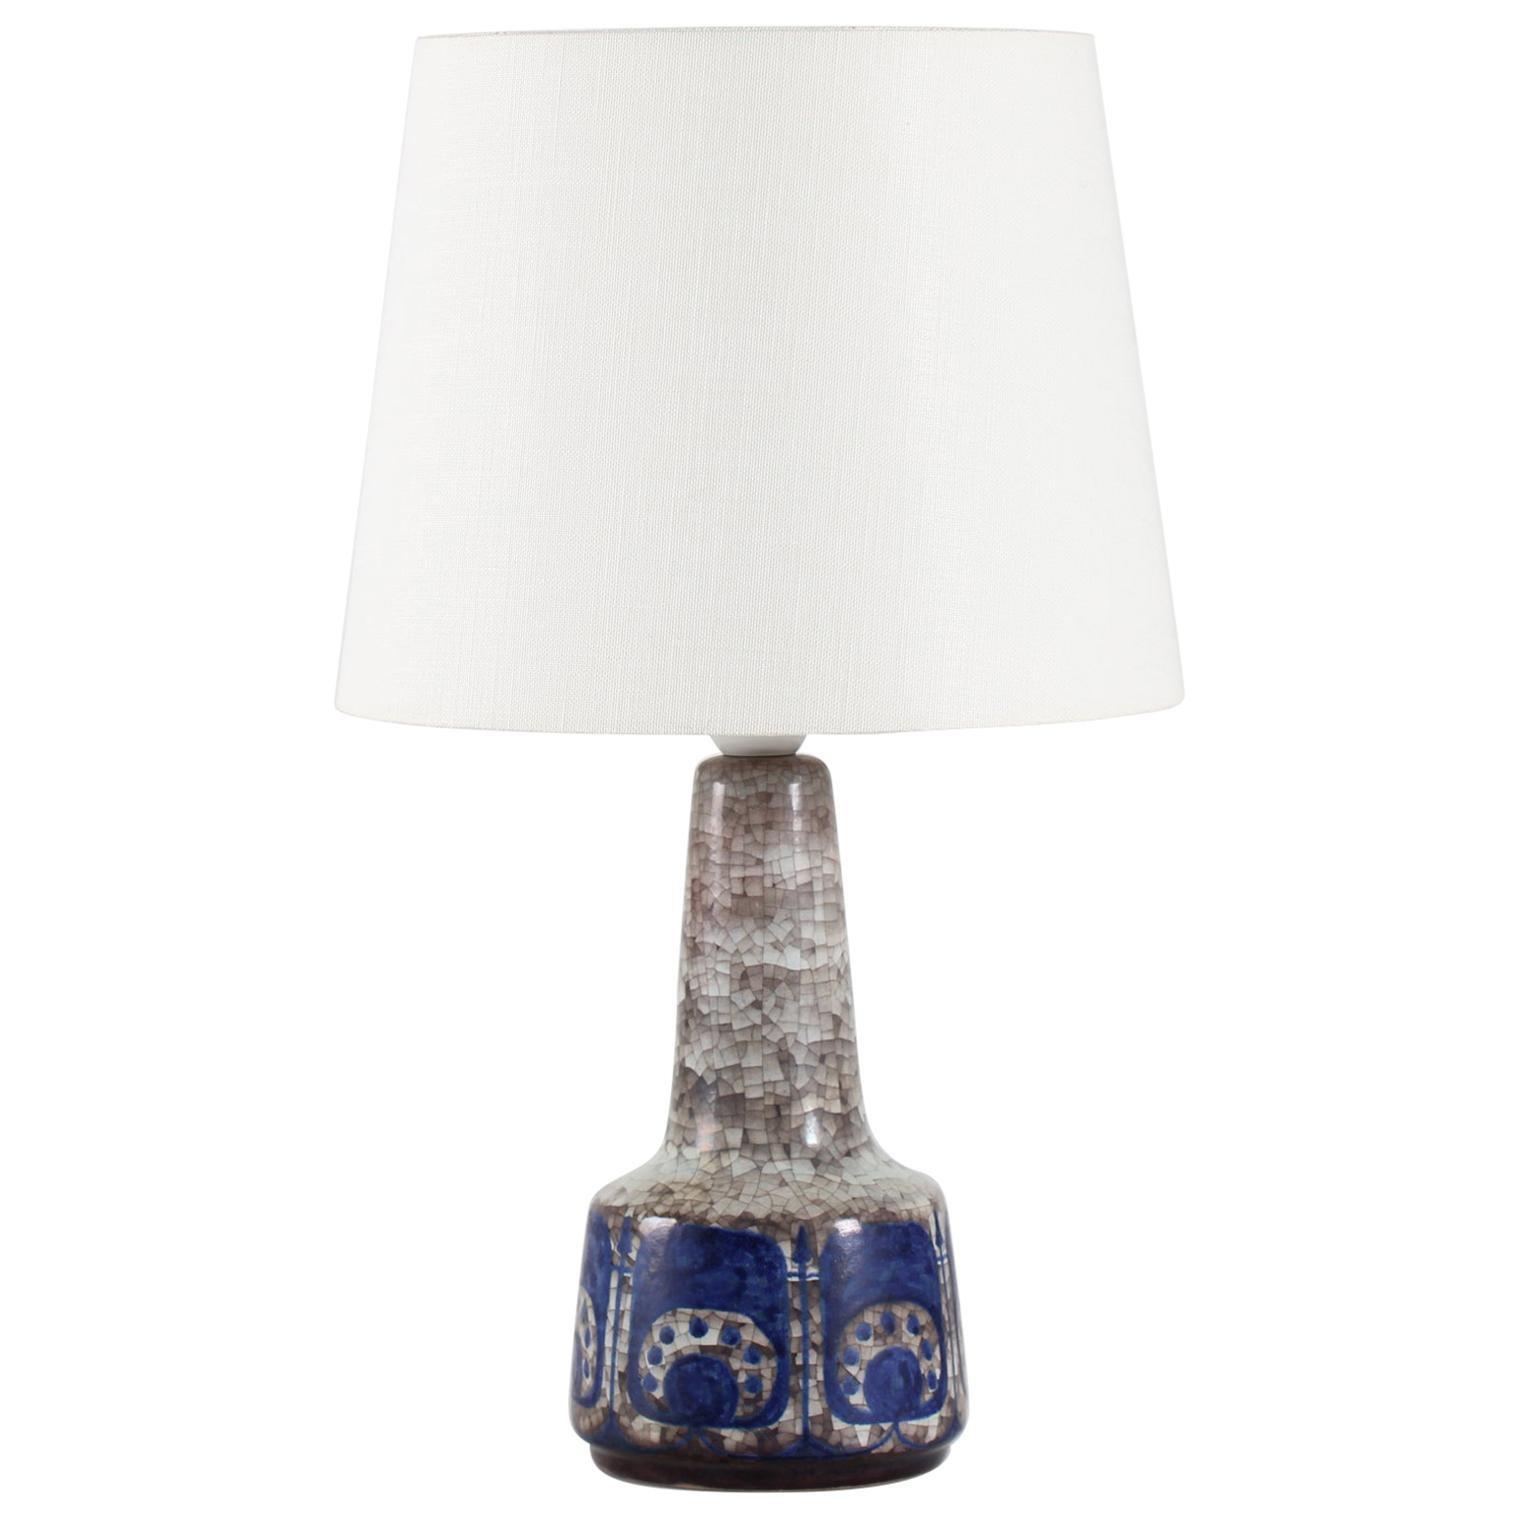 Vintage Danish Marianne Starck for Michael Andersen Table Lamp Blue Persia 1960s